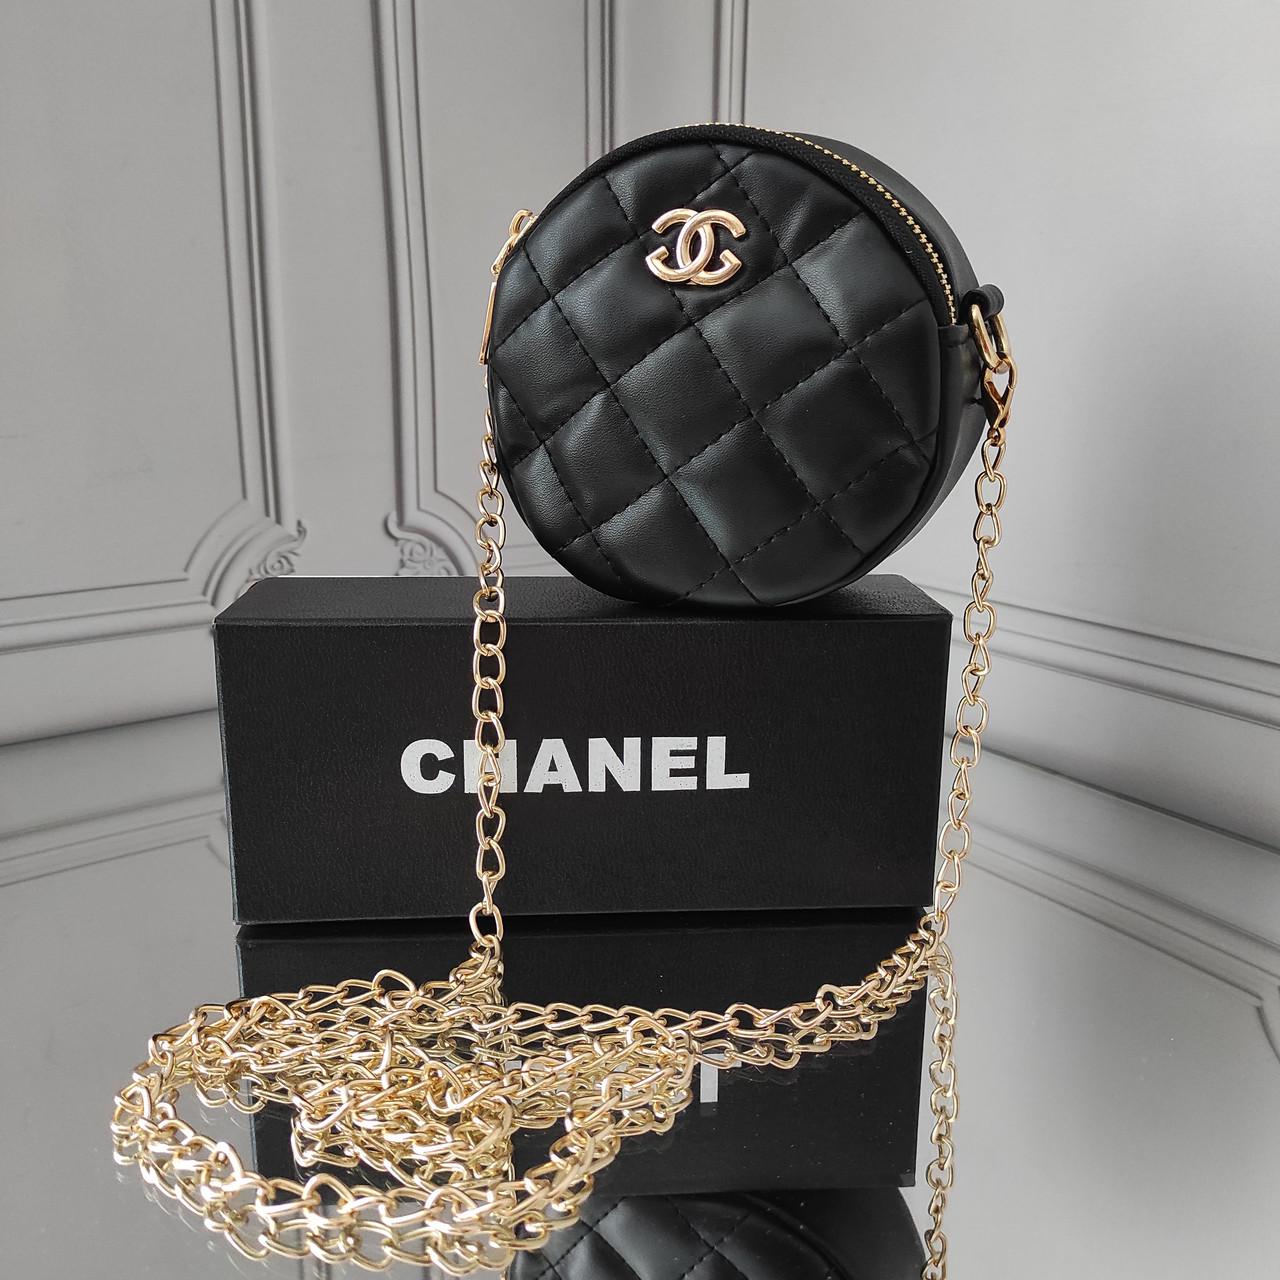 Мини кросс боди, сумка Chanel